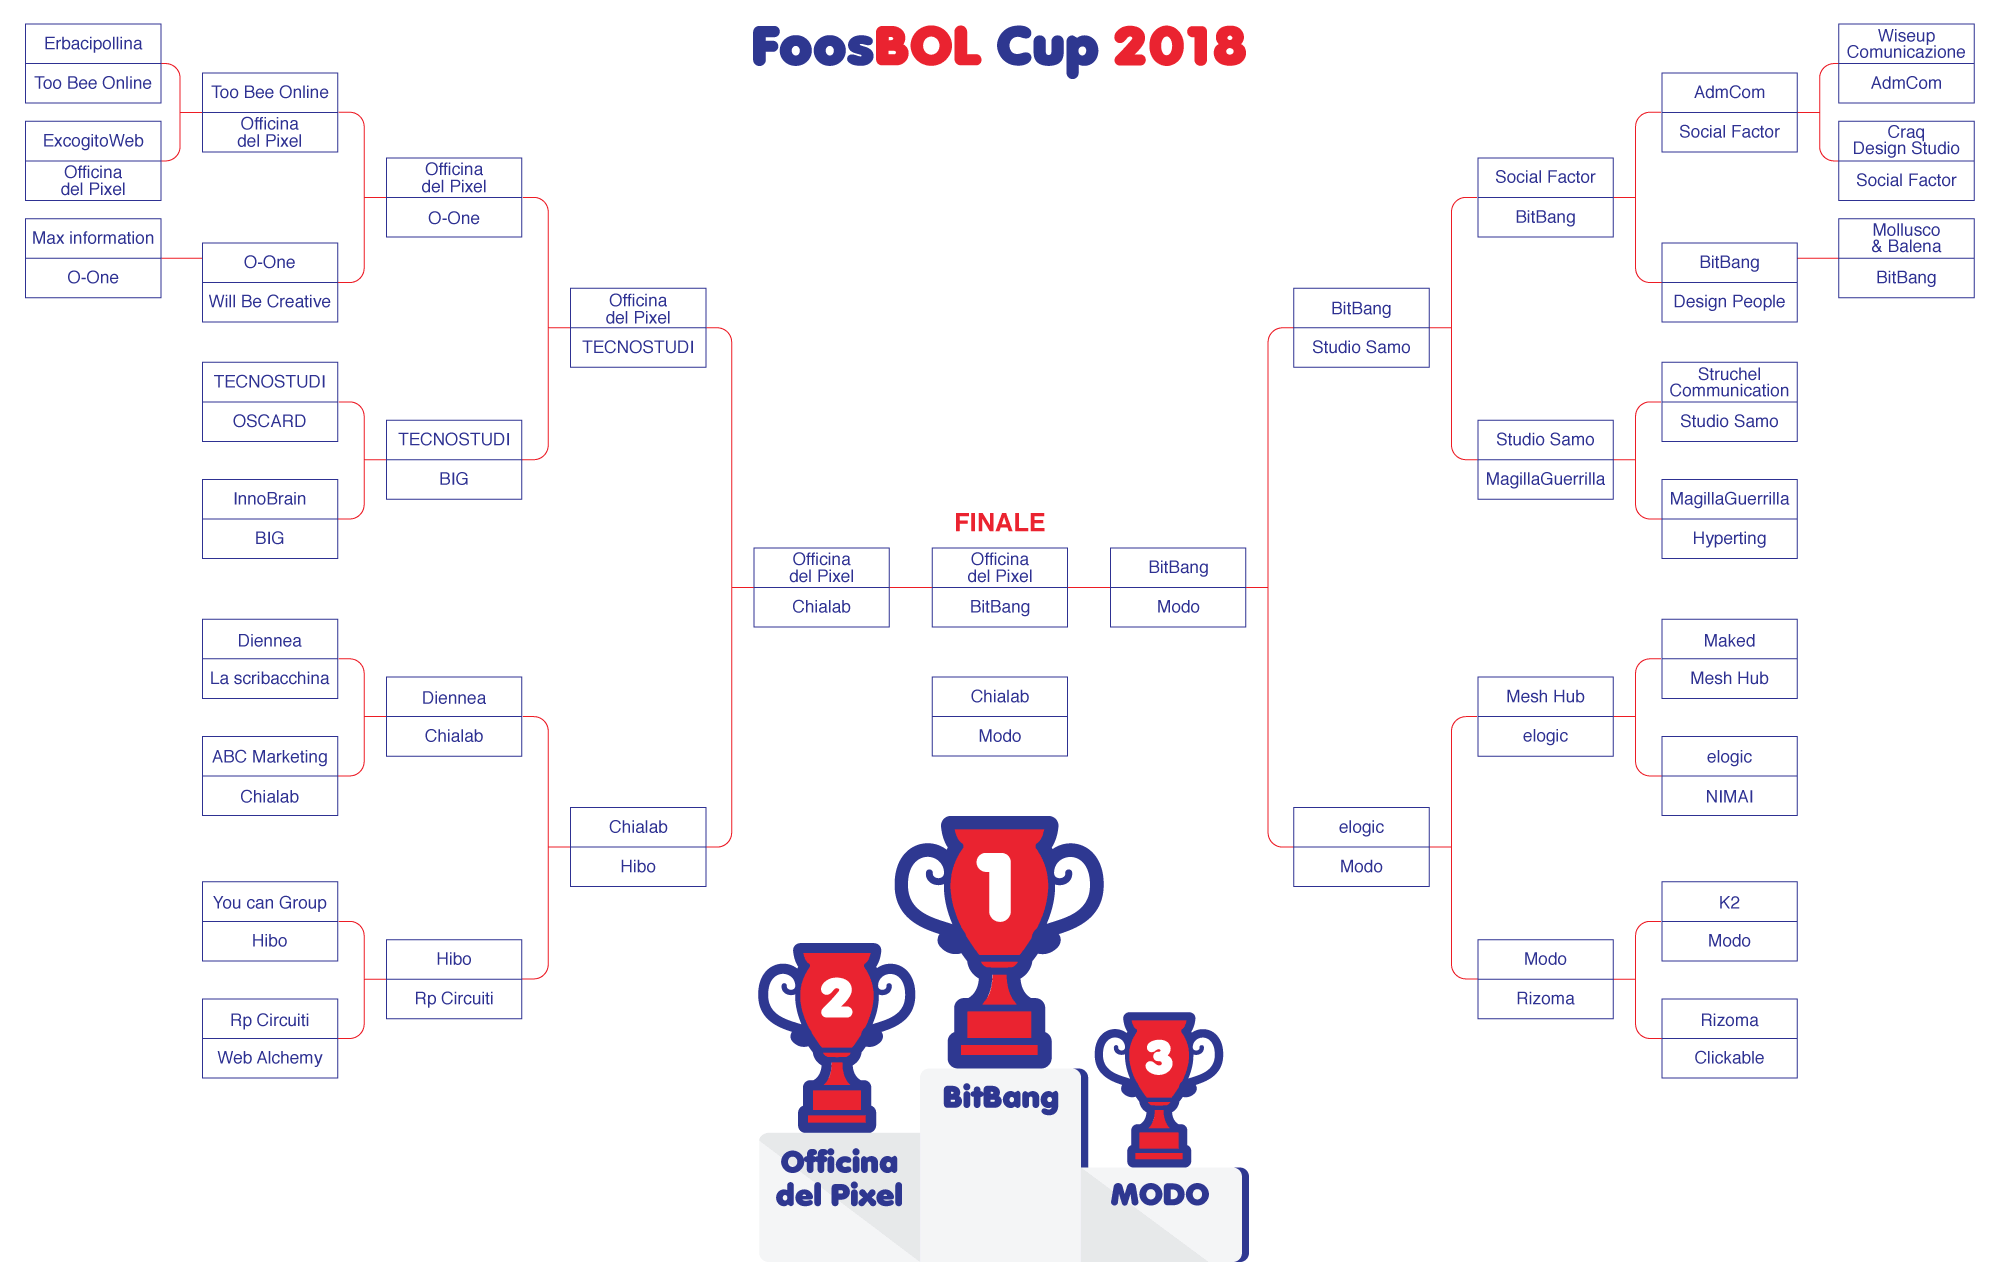 Tabellone FoosBol CUP